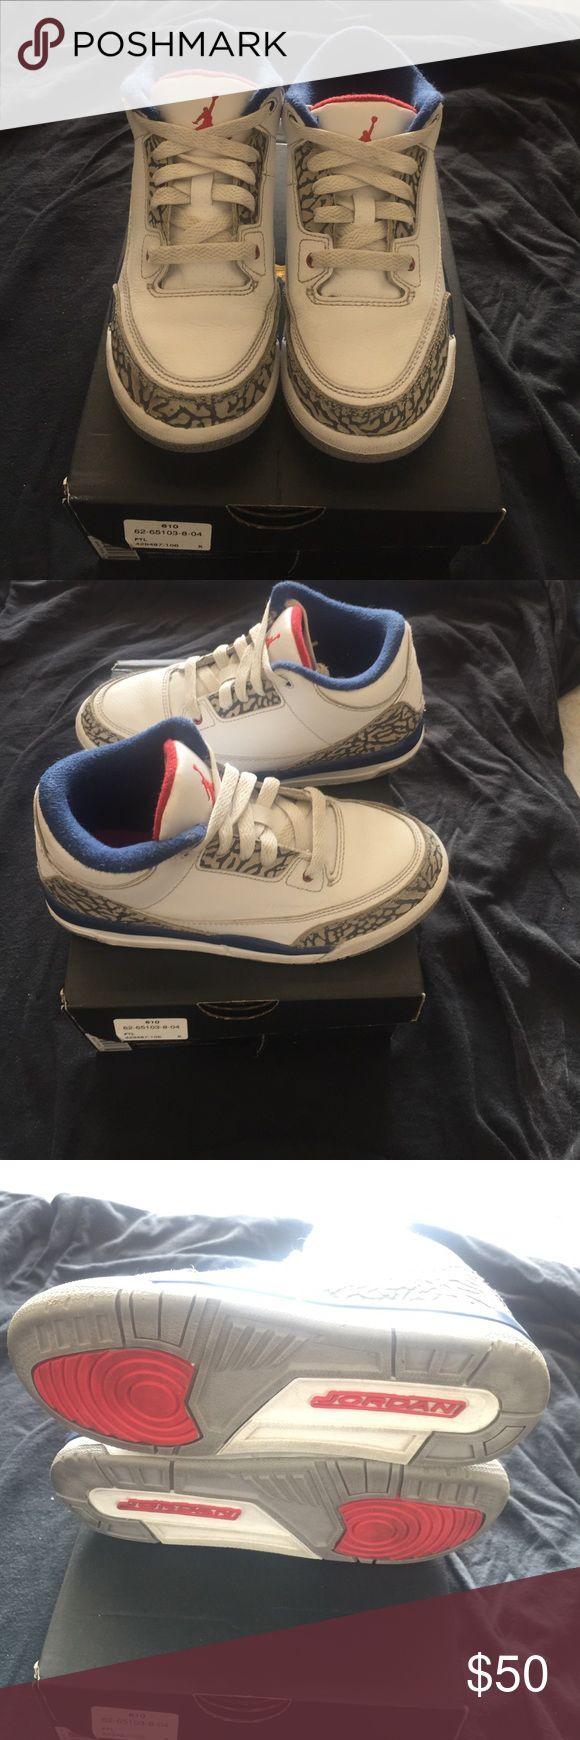 Jordan Retro 3s size 1y Excellent condition size 1y Jordan 3s Air Jordan Shoes Sneakers